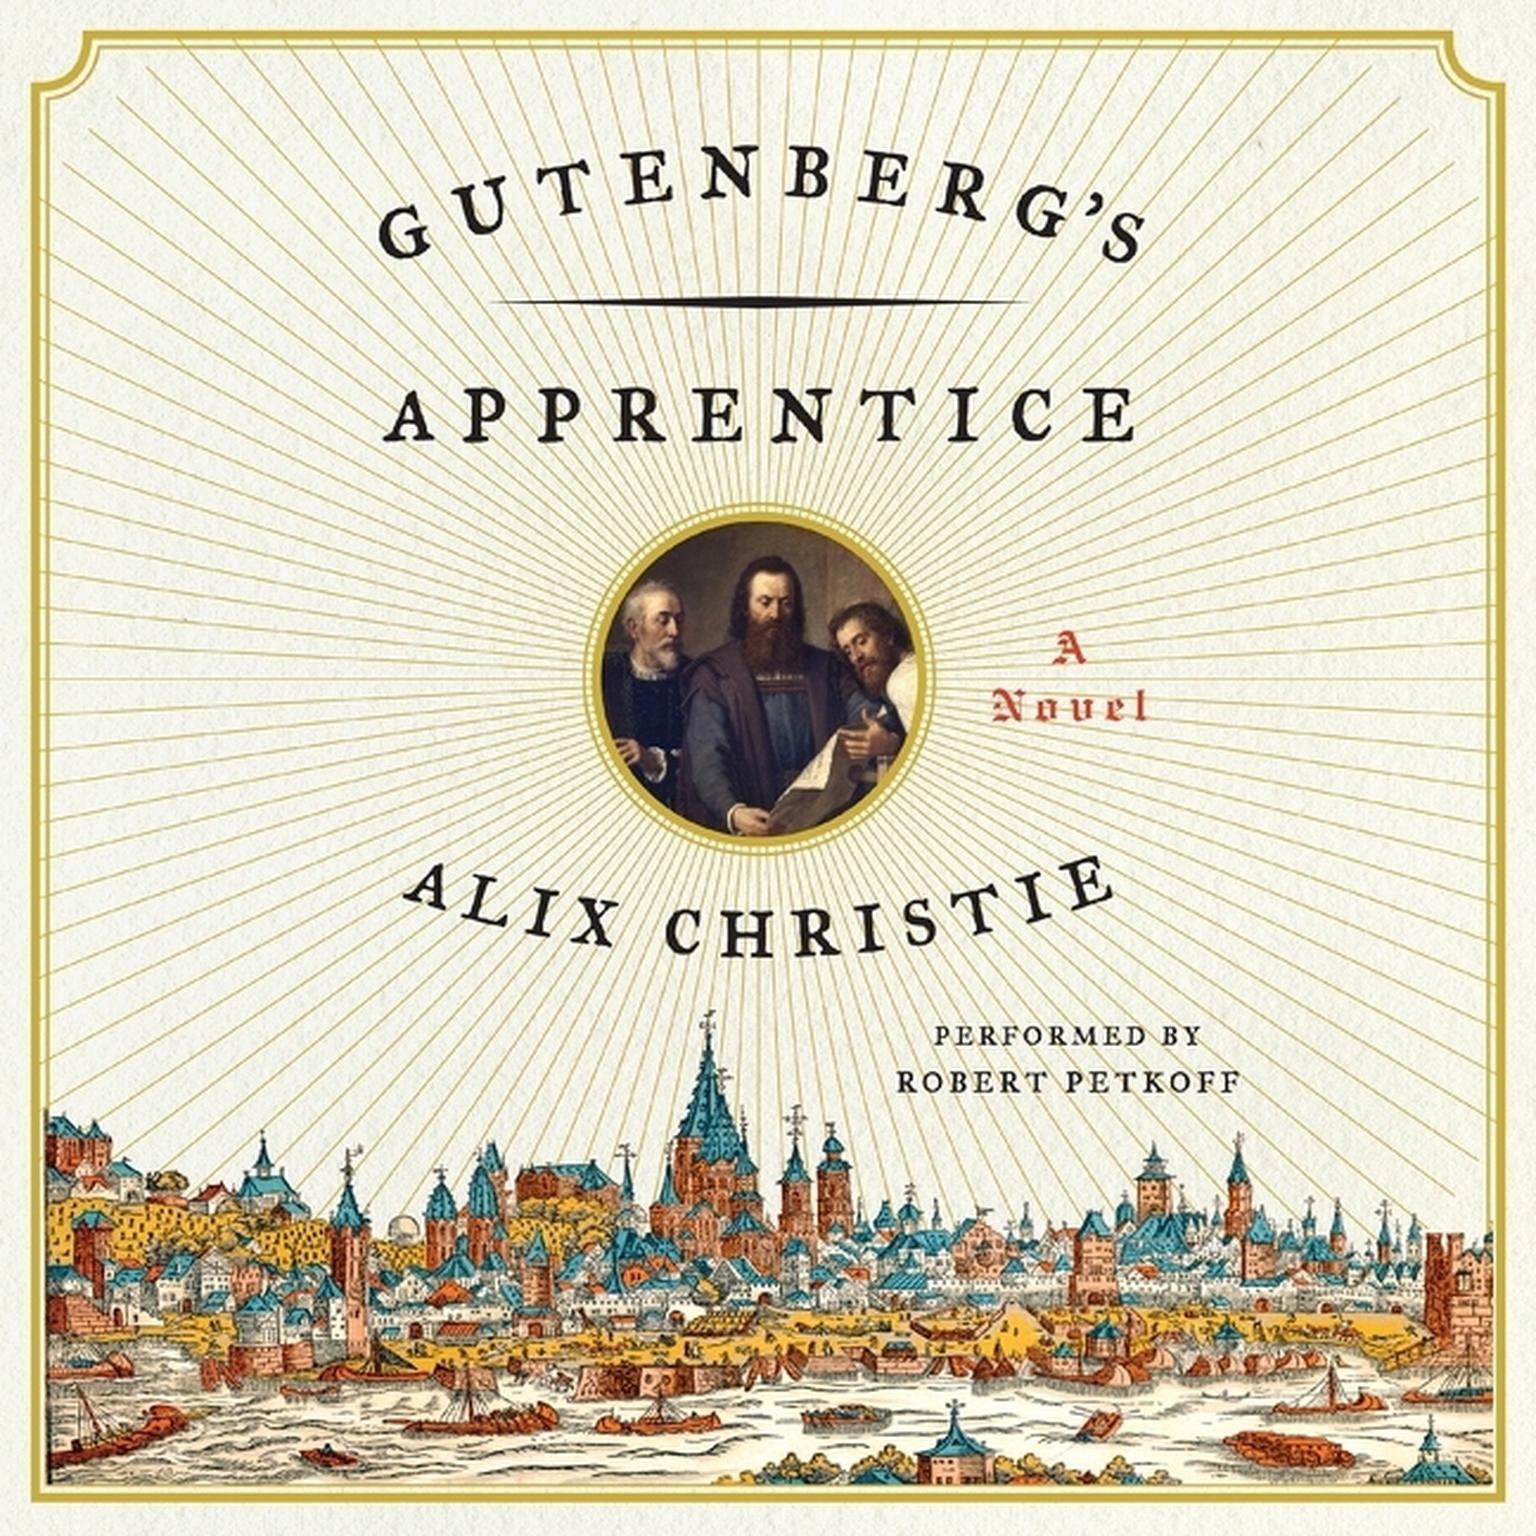 Gutenbergs Apprentice: A Novel Audiobook, by Alix Christie